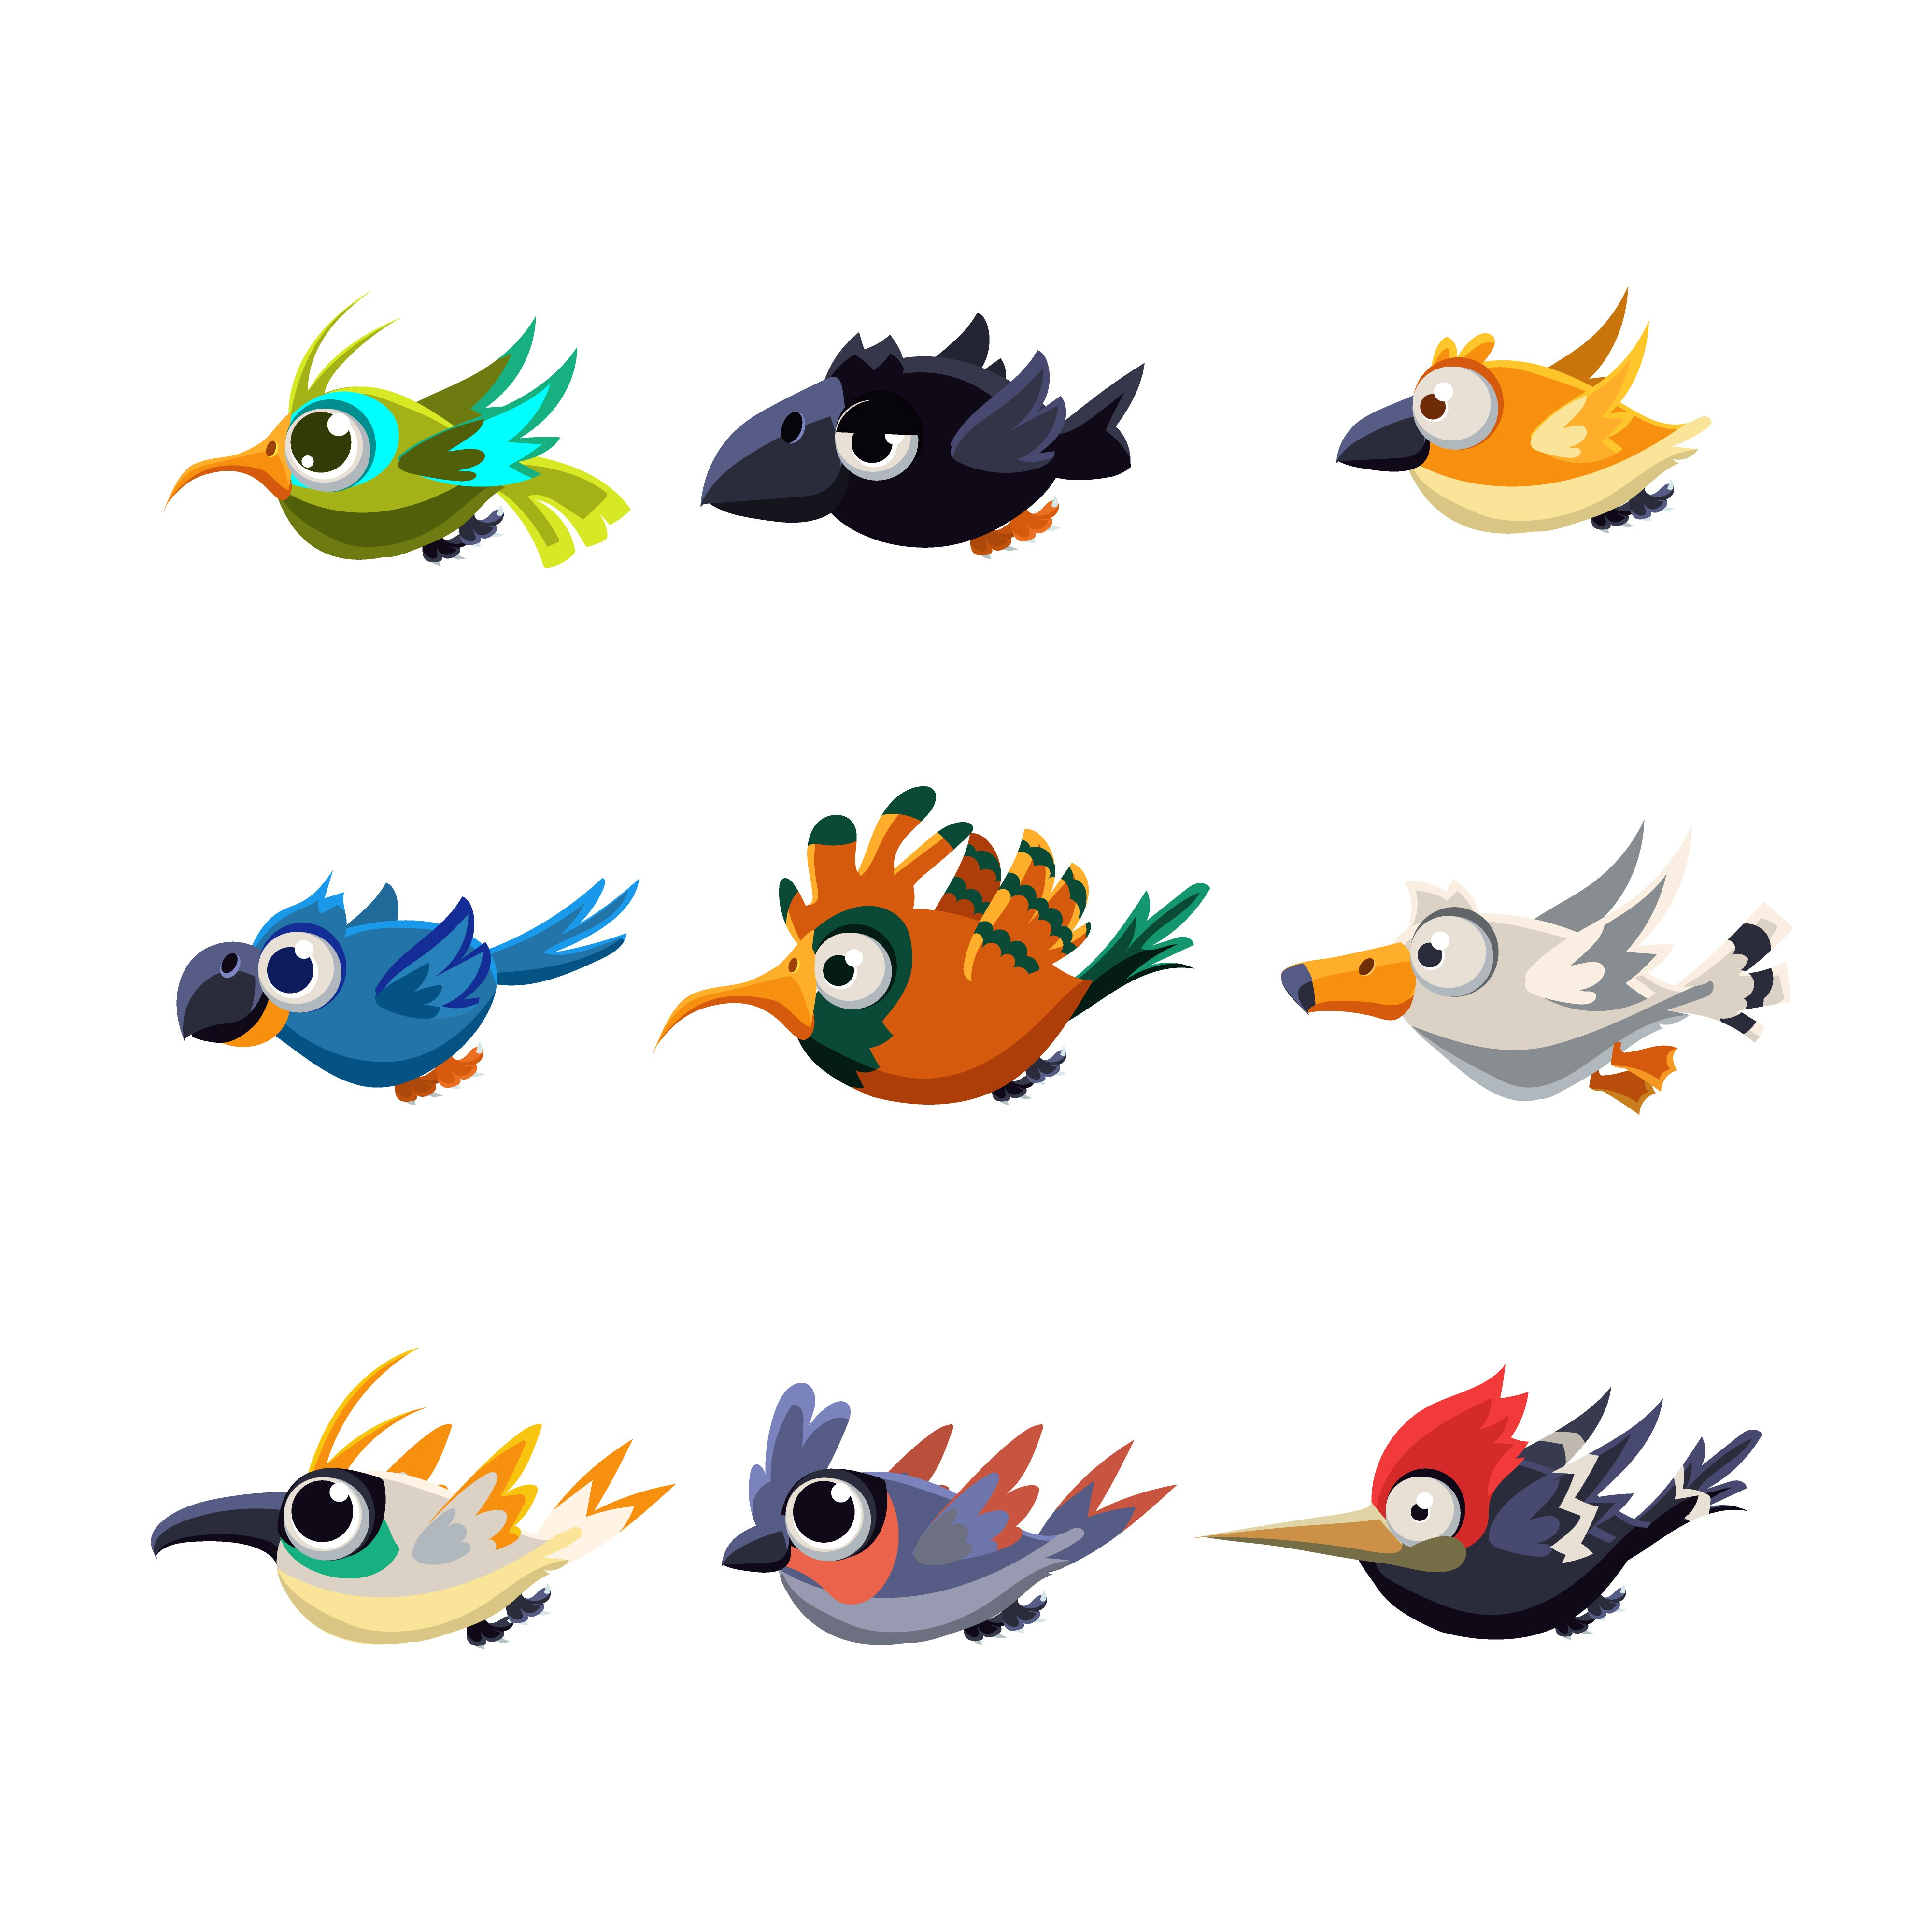 Cute Flying Birds Vector ~ Illustrations ~ Creative Market - photo#26